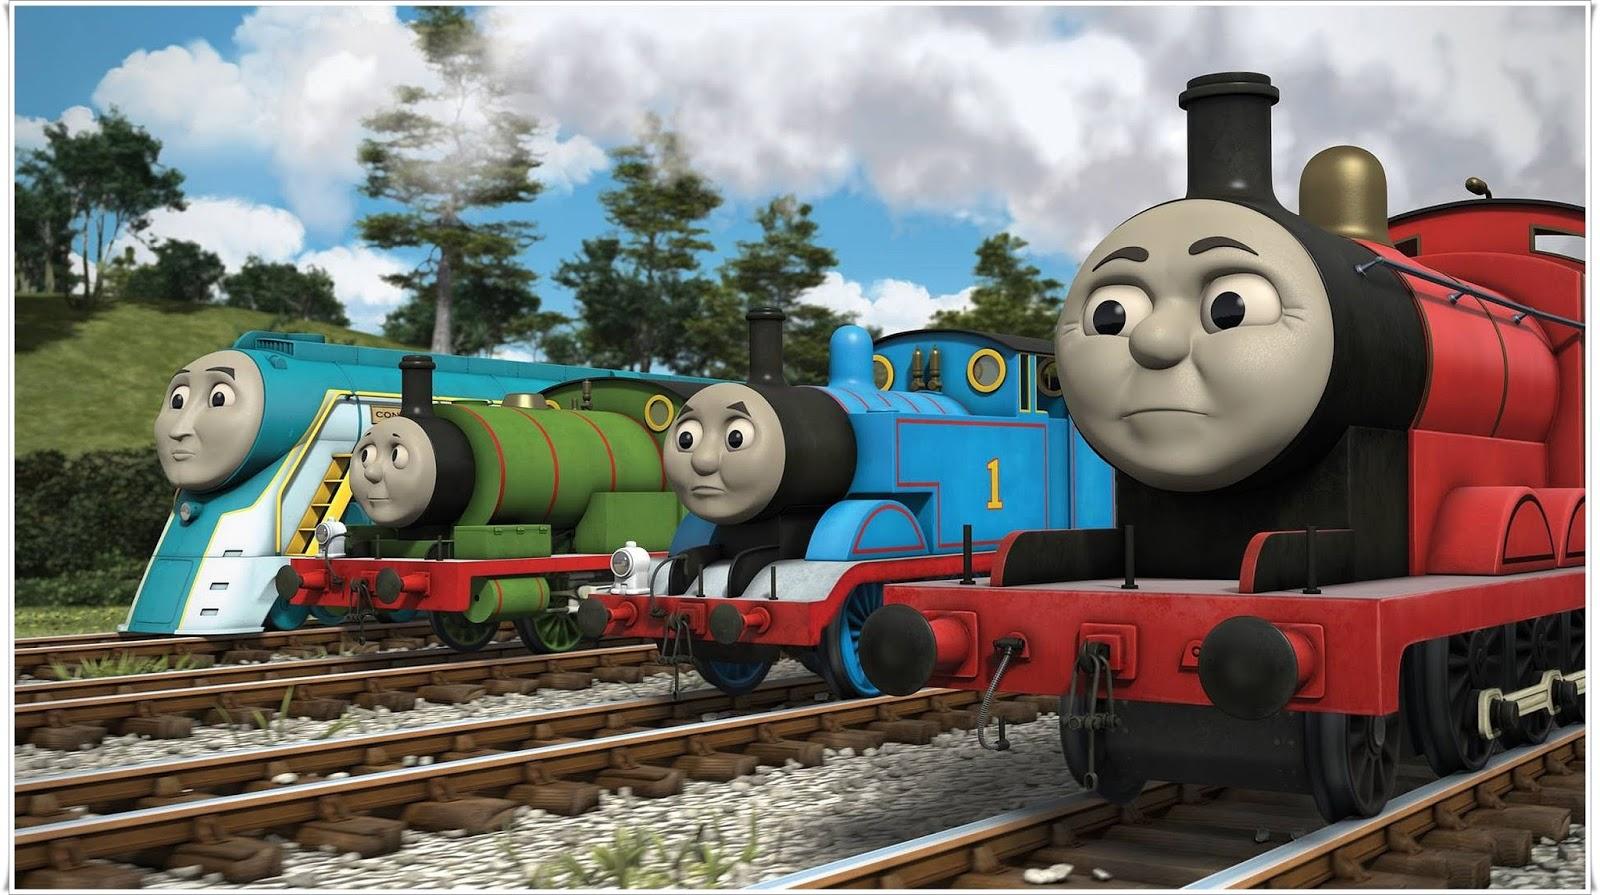 Koleksi Gambar Kartun Kereta Api Thomas